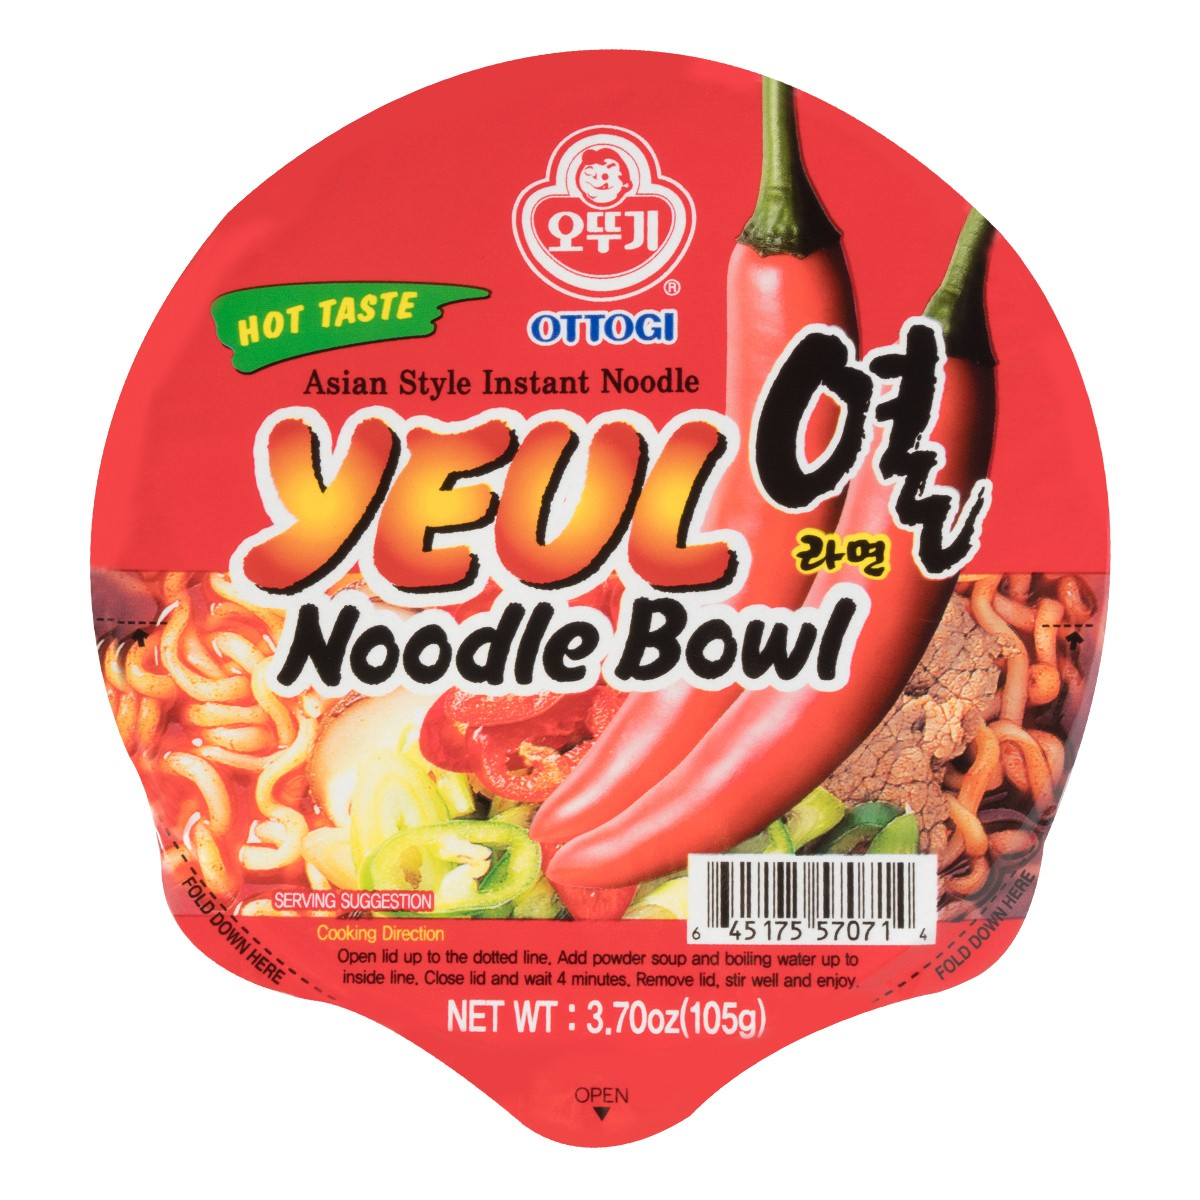 OTTOGI YEUL Noodle Bowl Hot Taste 105g